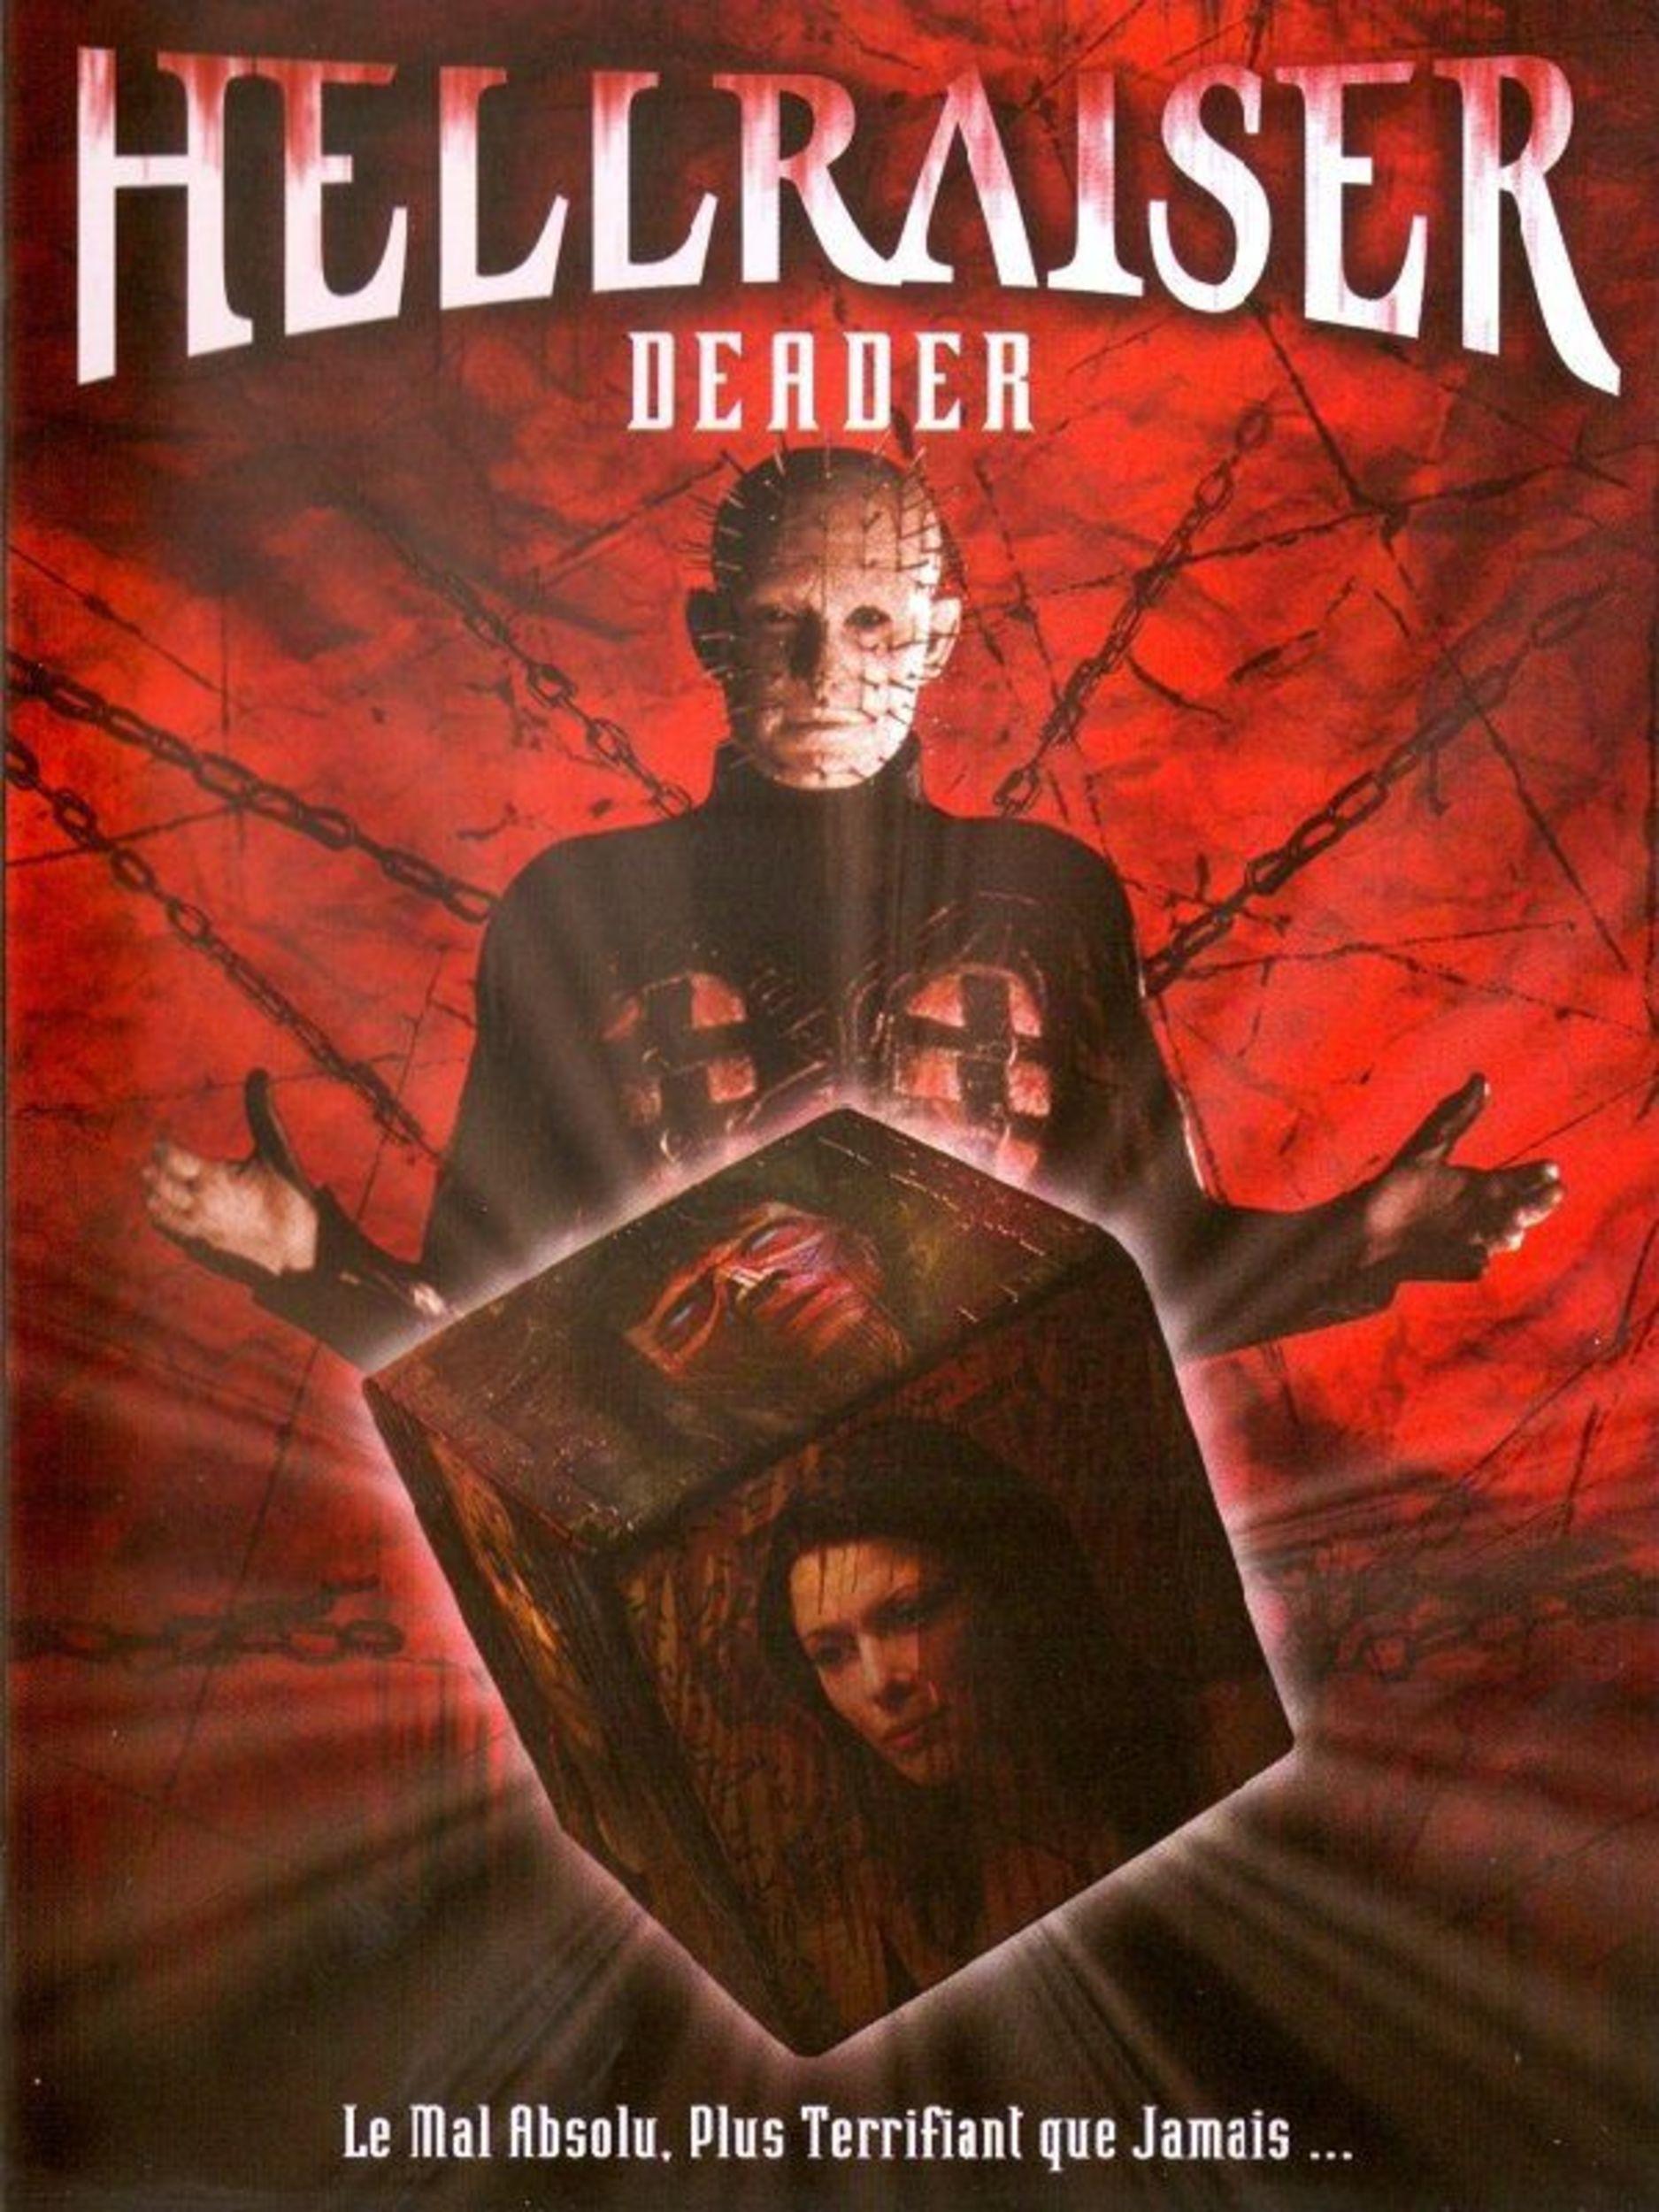 Affiche Poster hellraiser deader disney dimension